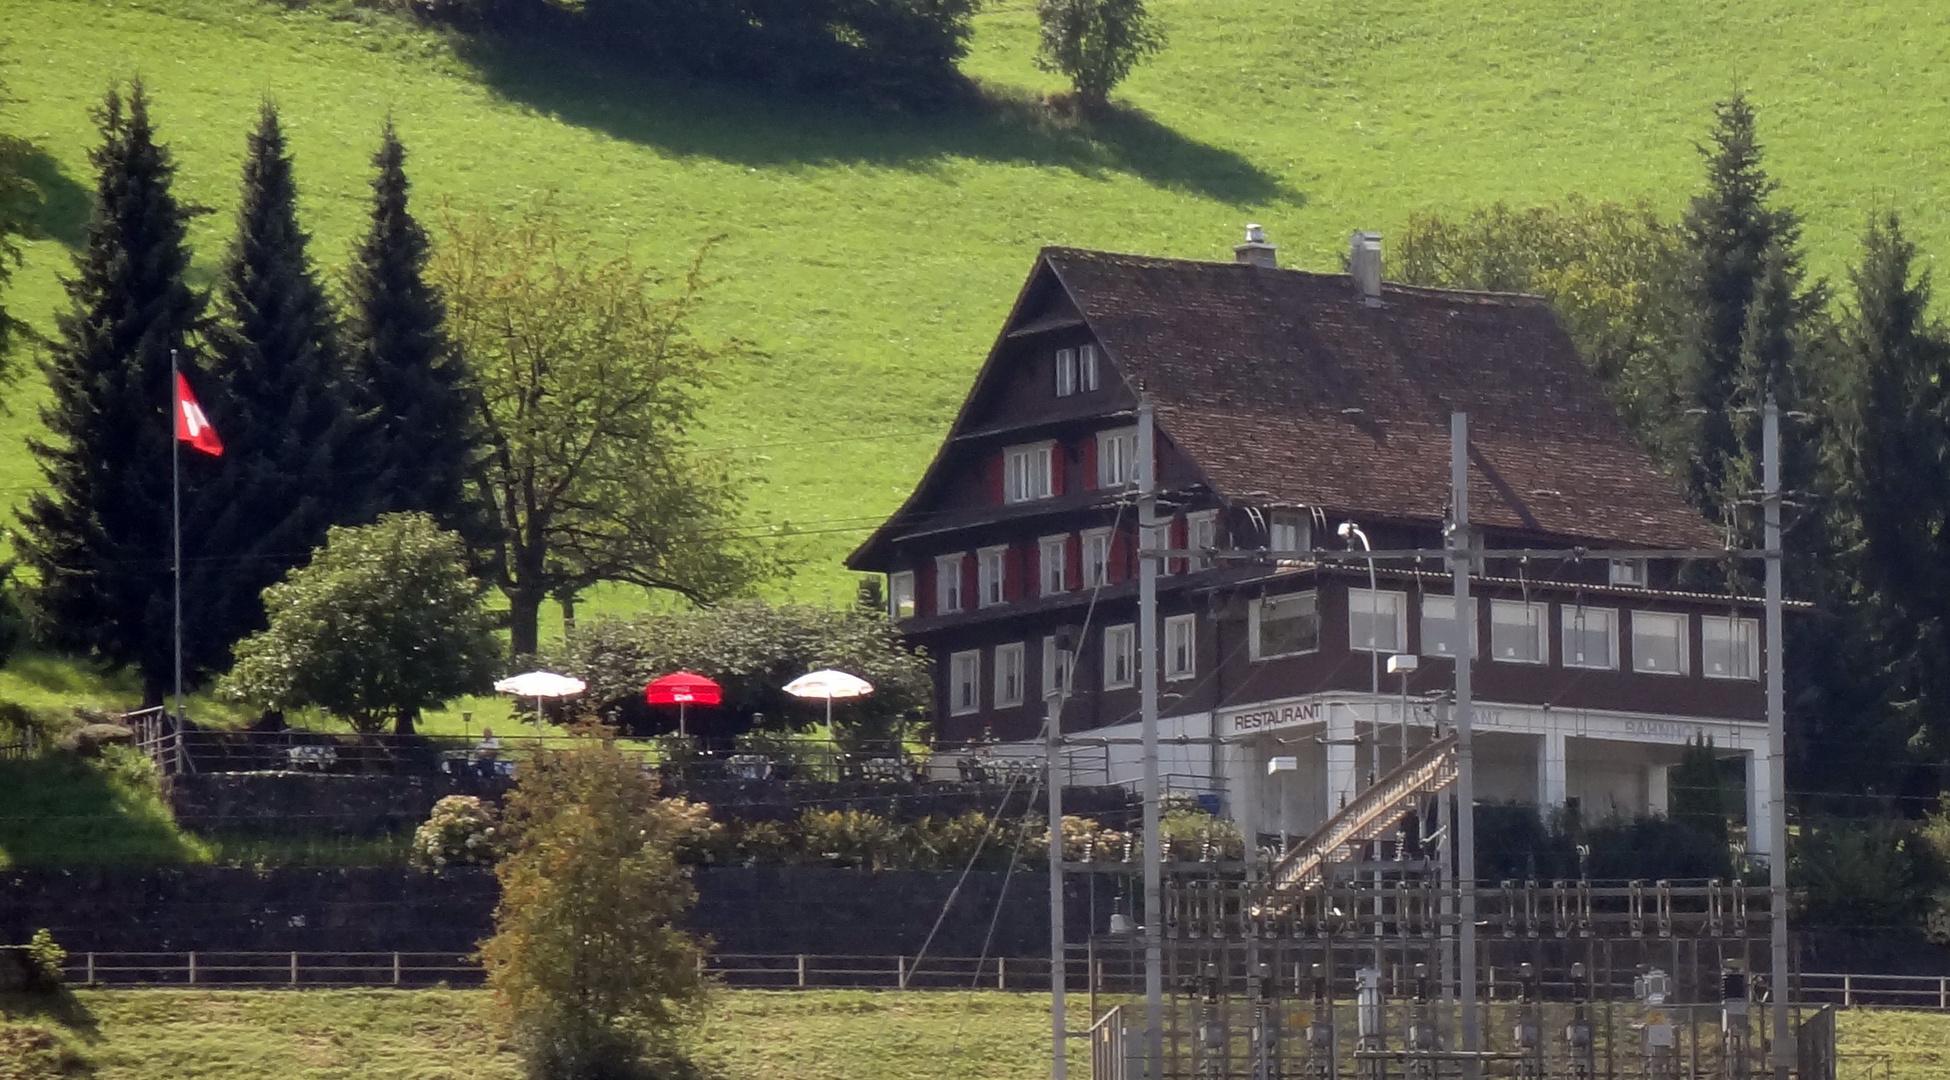 Hotel Bahnhof 2011